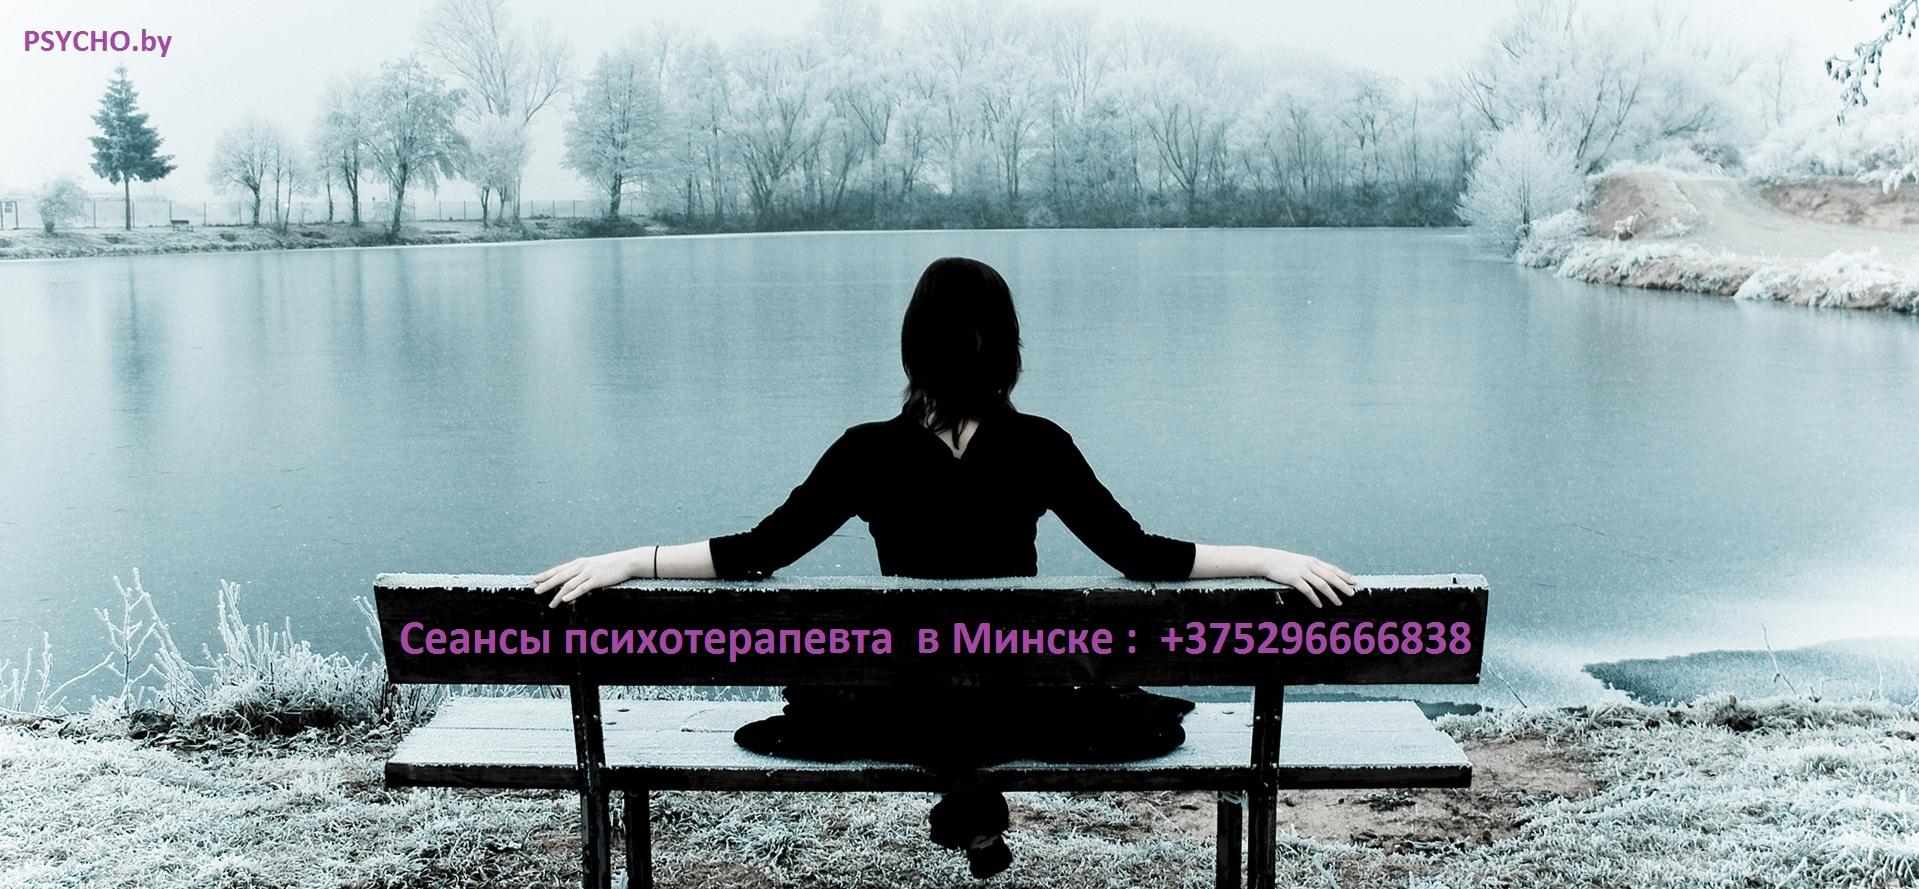 Depressia_PSYCHO.by_011